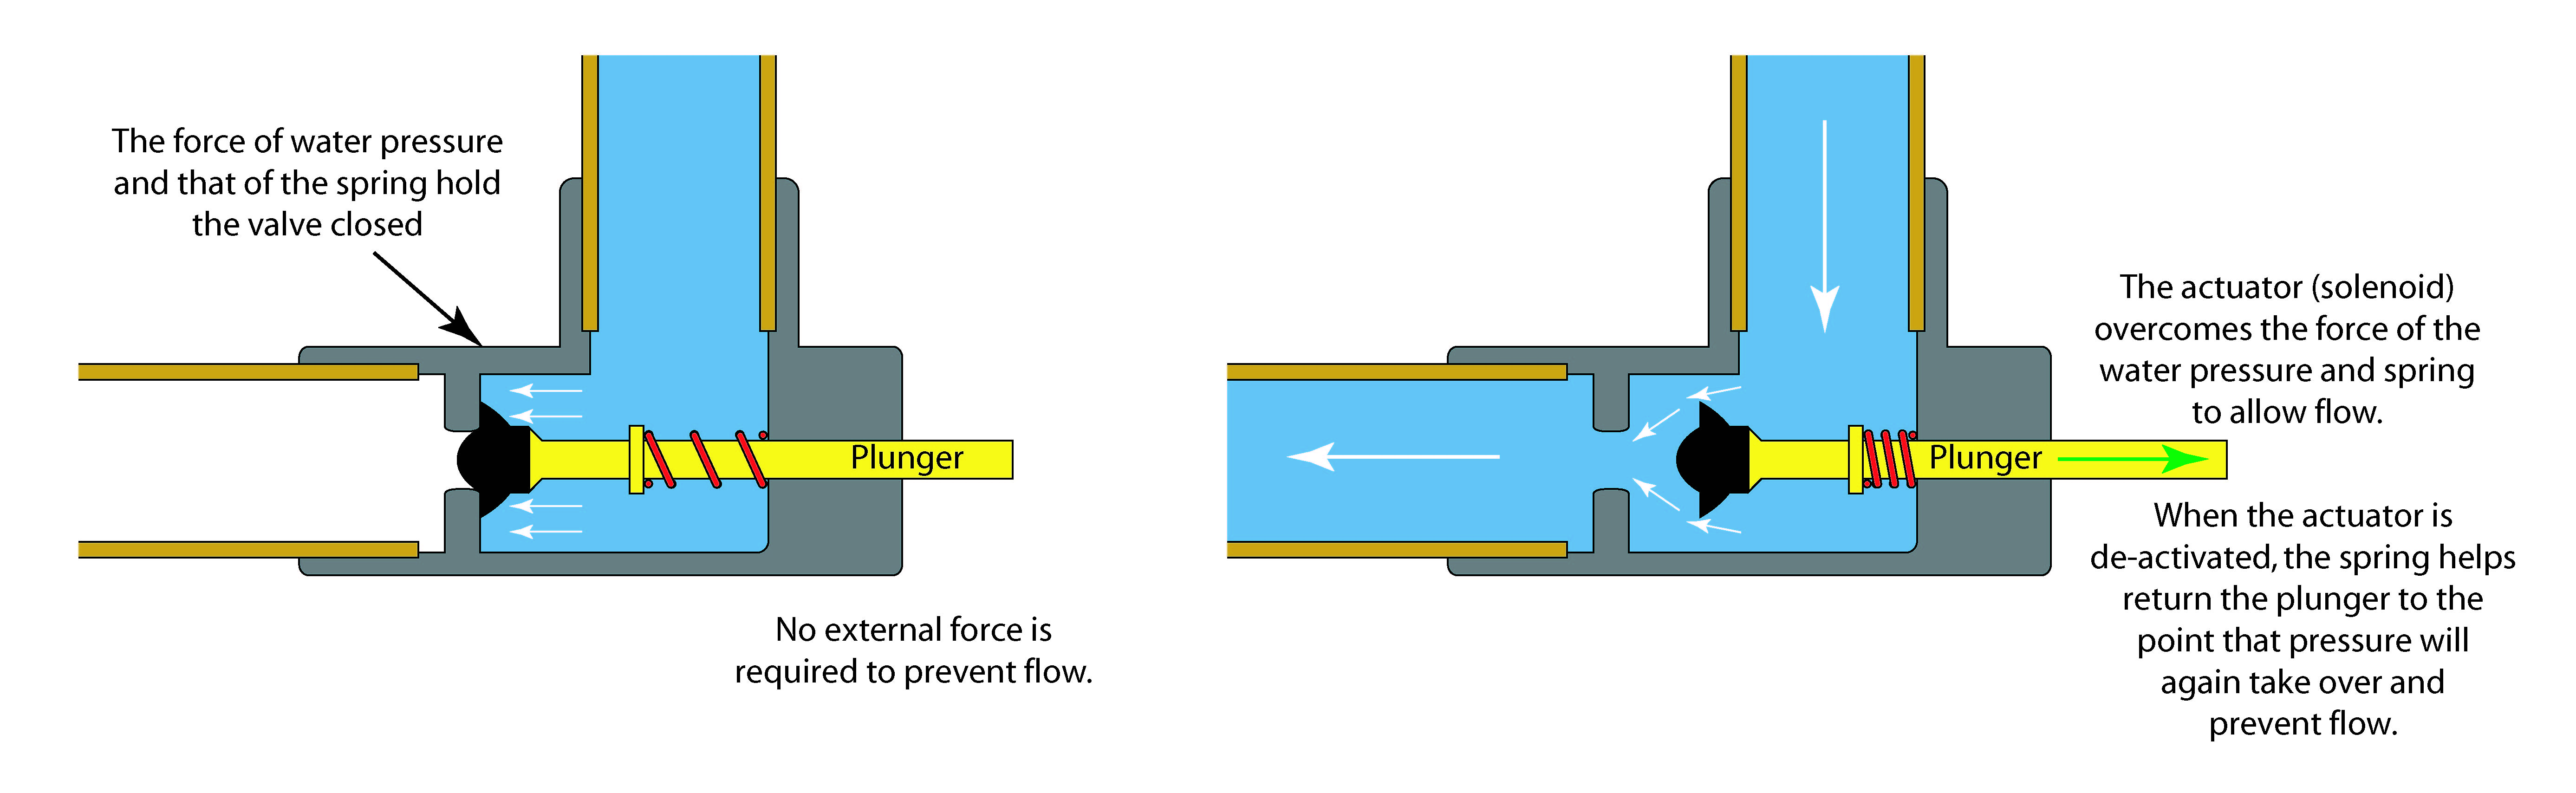 how to read solenoid valve diagrams burglar alarm pir sensor wiring diagram valves automated what 39s different ctg